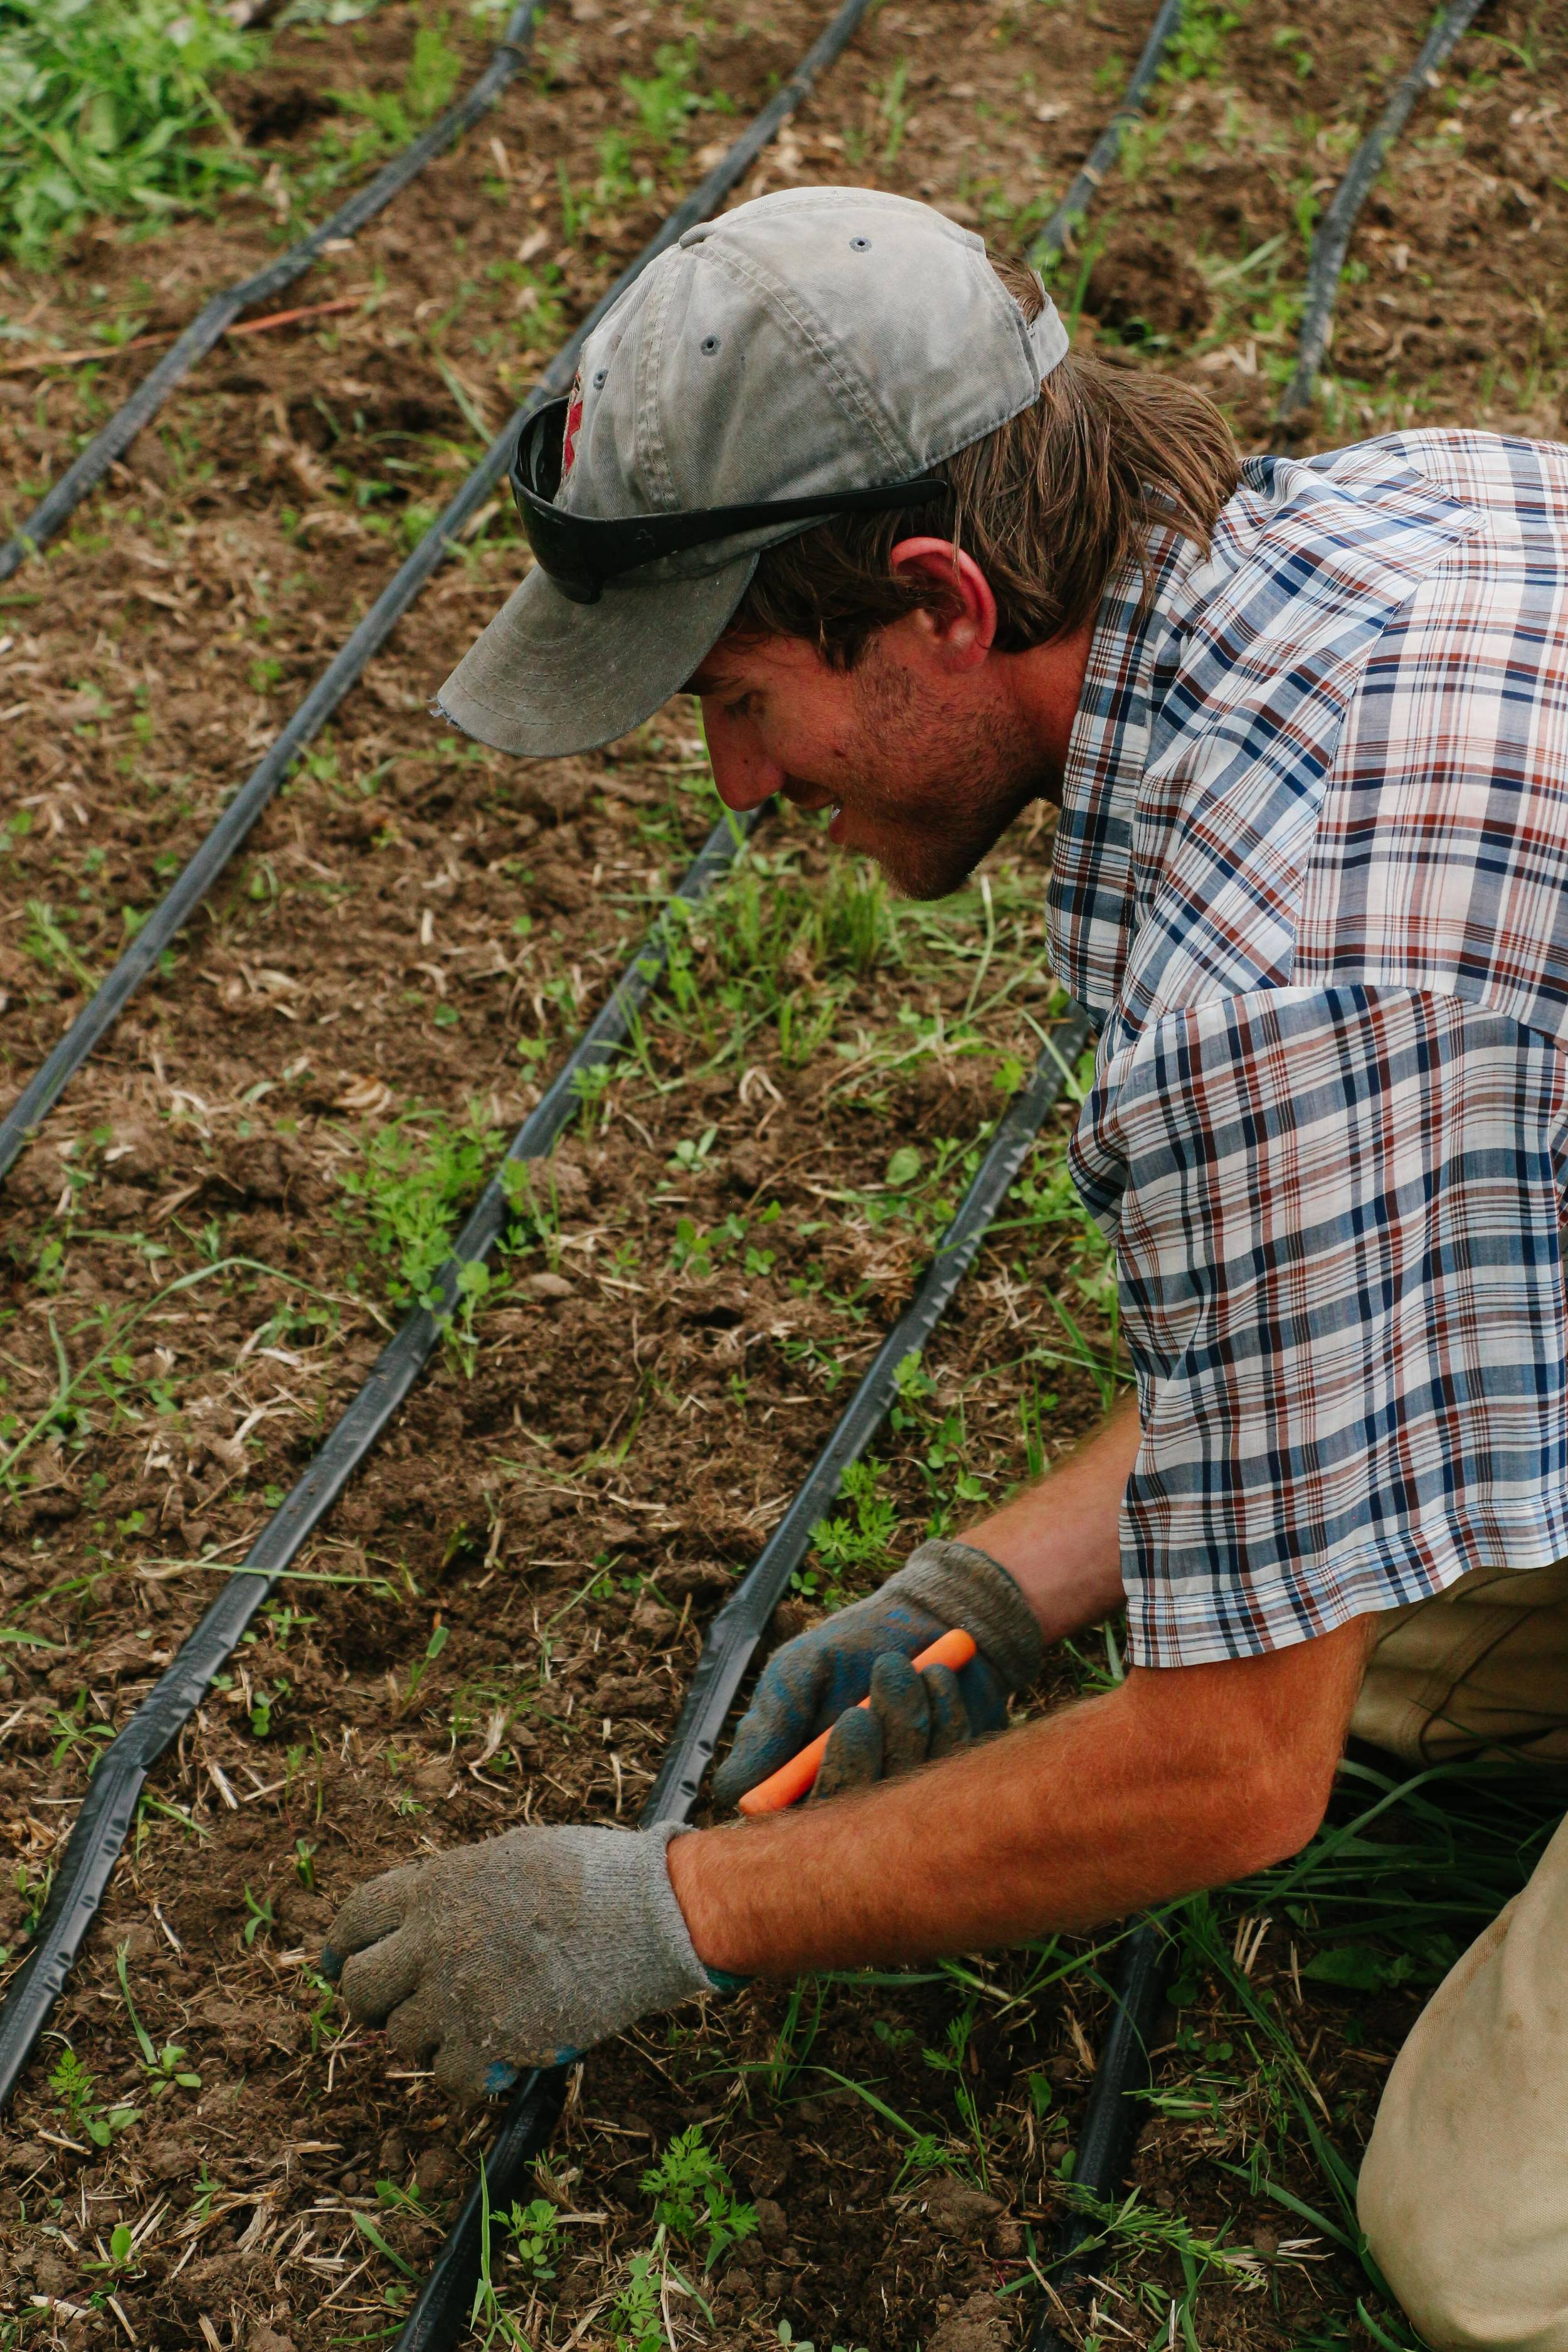 Ben Pfeffer weeding at Raisin Roots Farm